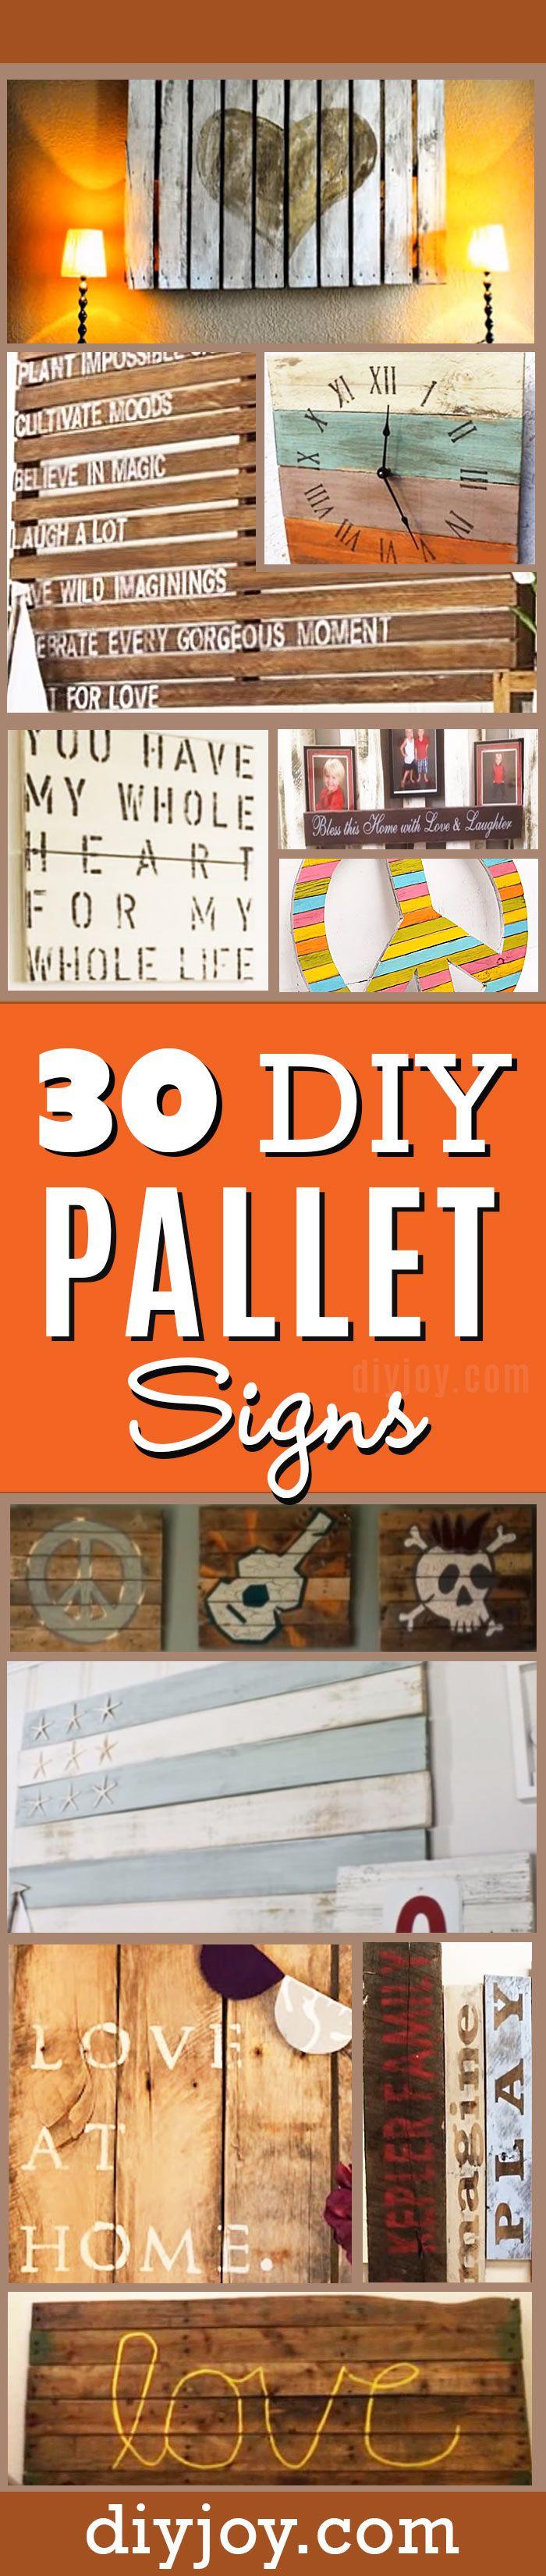 30 Rustic DIY Wood Pallet Art Ideas